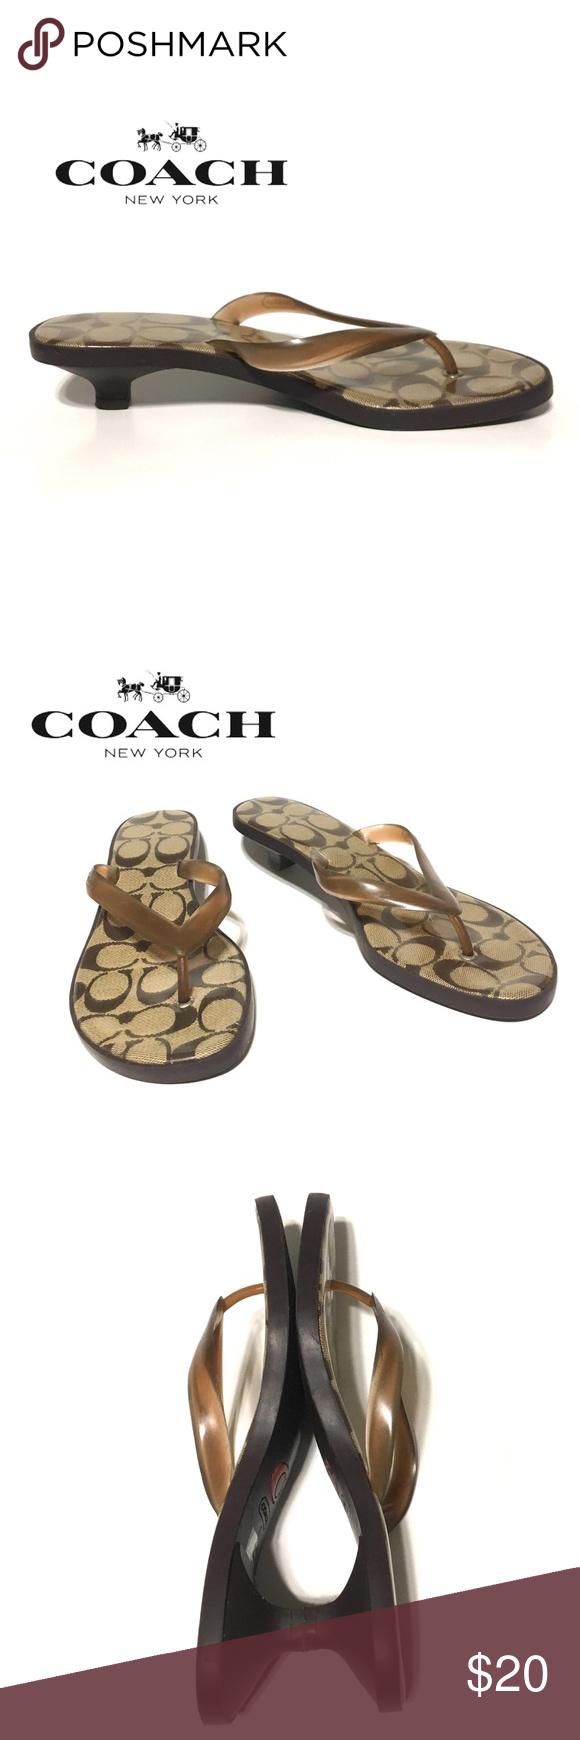 Coach Carin Kitten Heel Thing Sandal Flip Flops Kitten Heels Brown Flip Flops Flip Flop Sandals